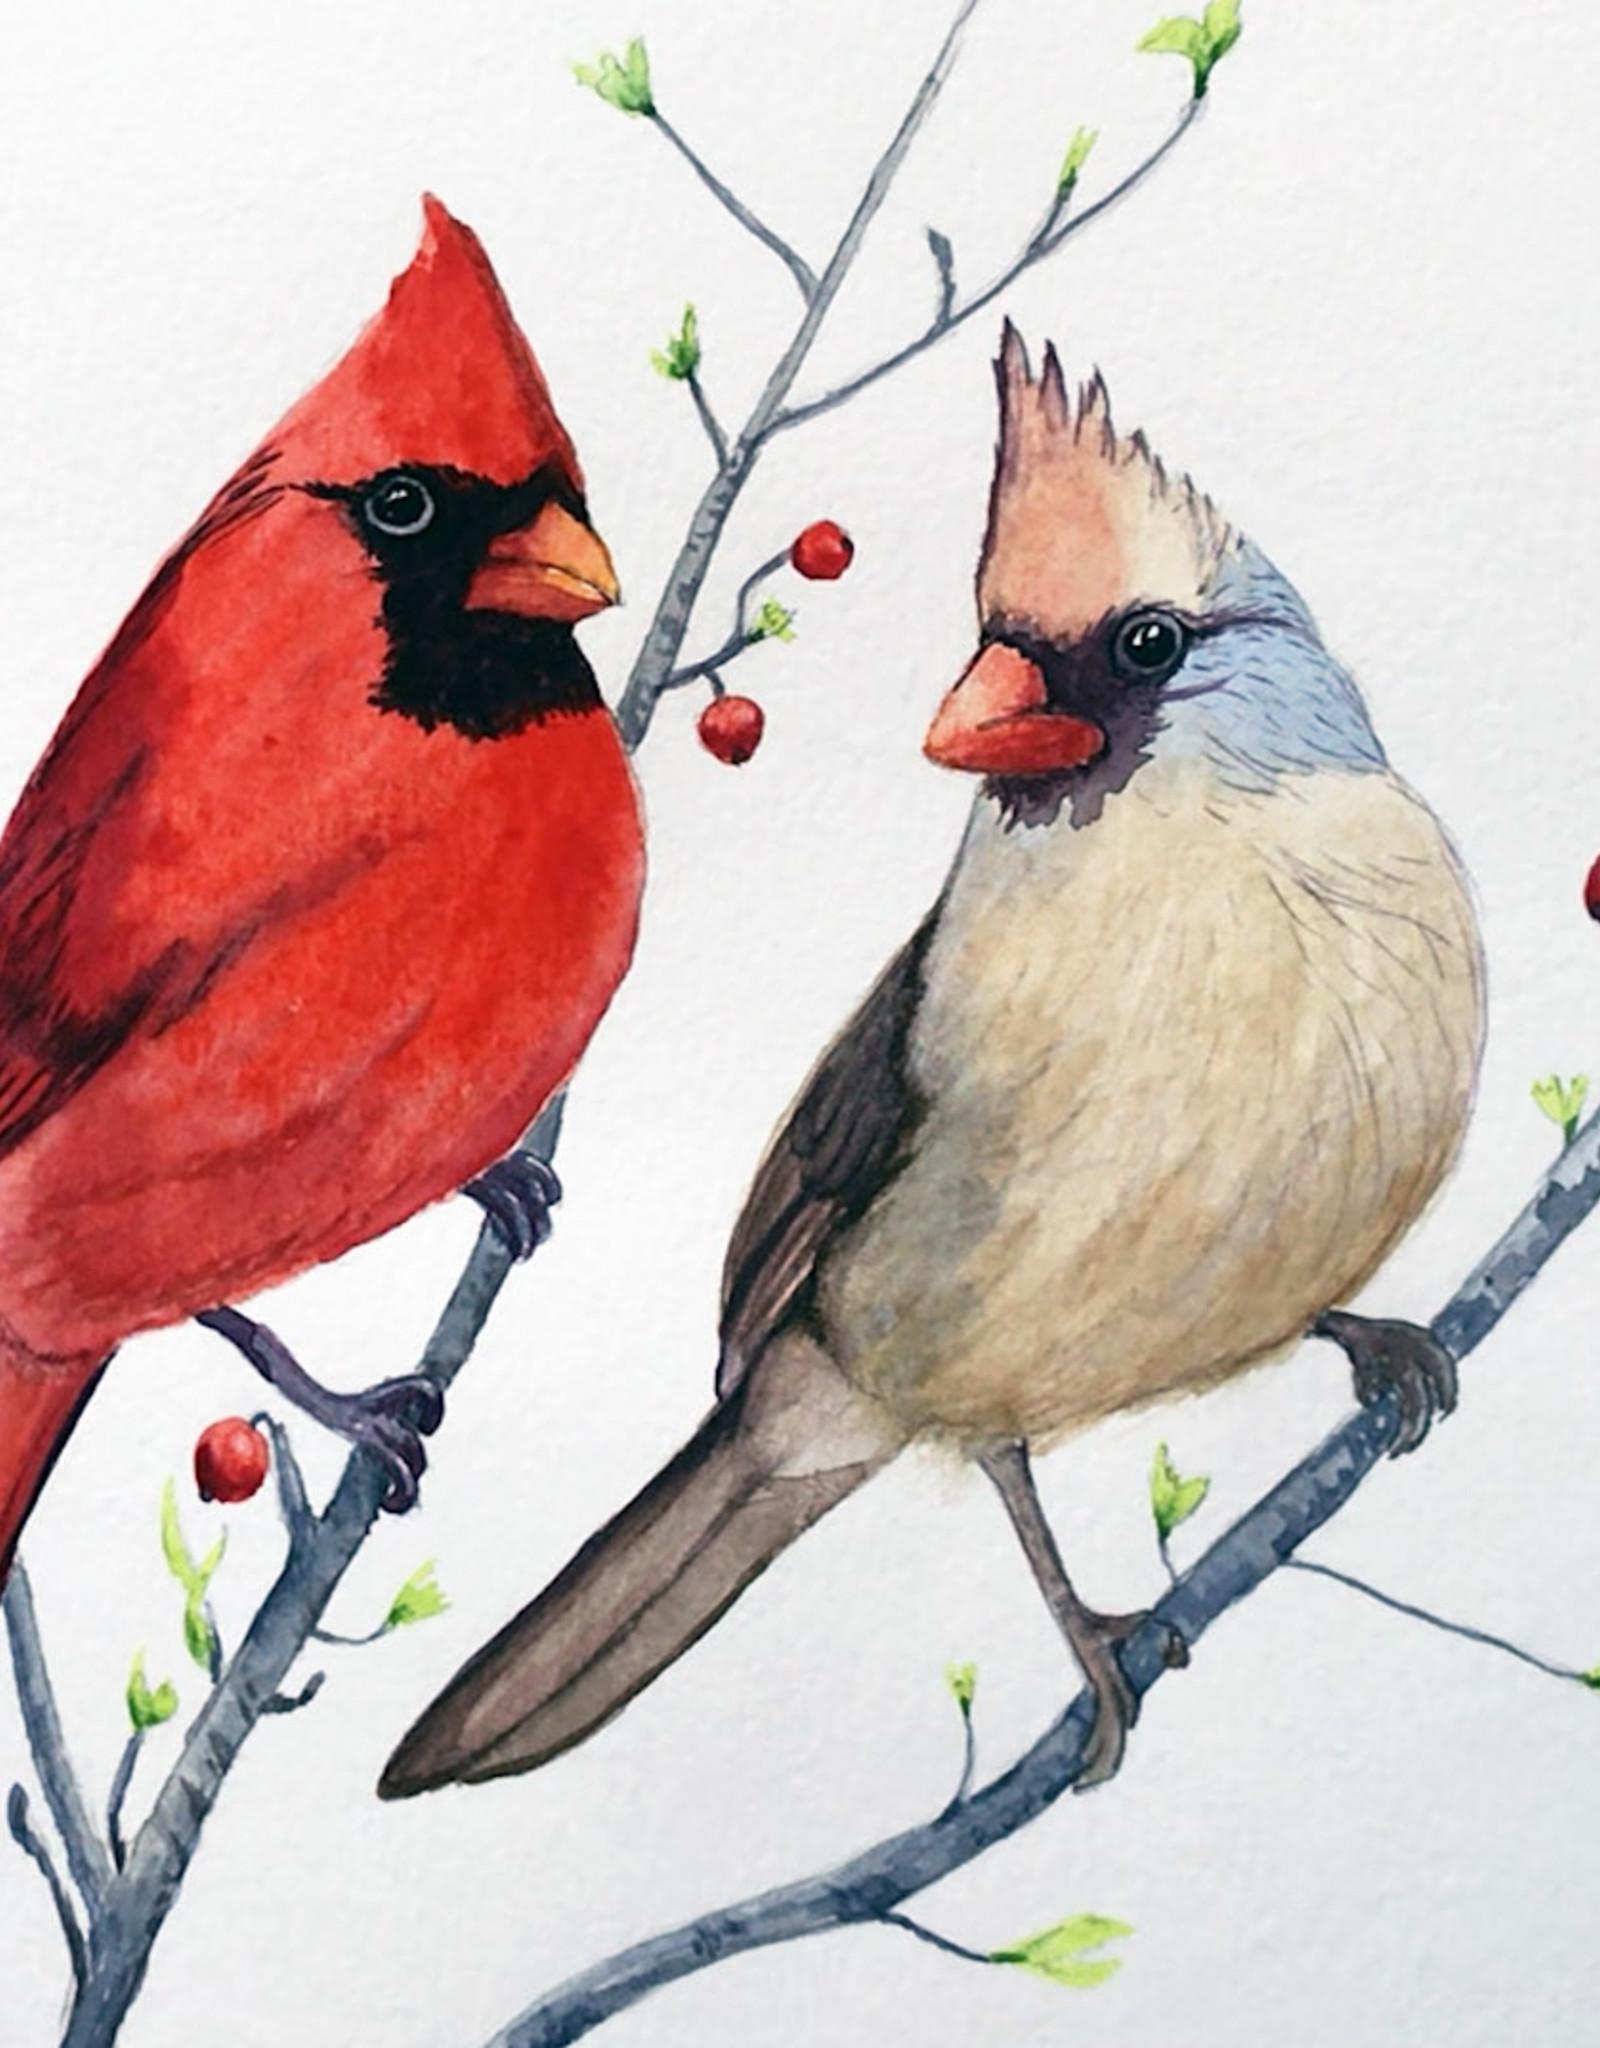 Tamara S Watercolour Art Class Cardinals Wed Sep 8 11am to 2pm